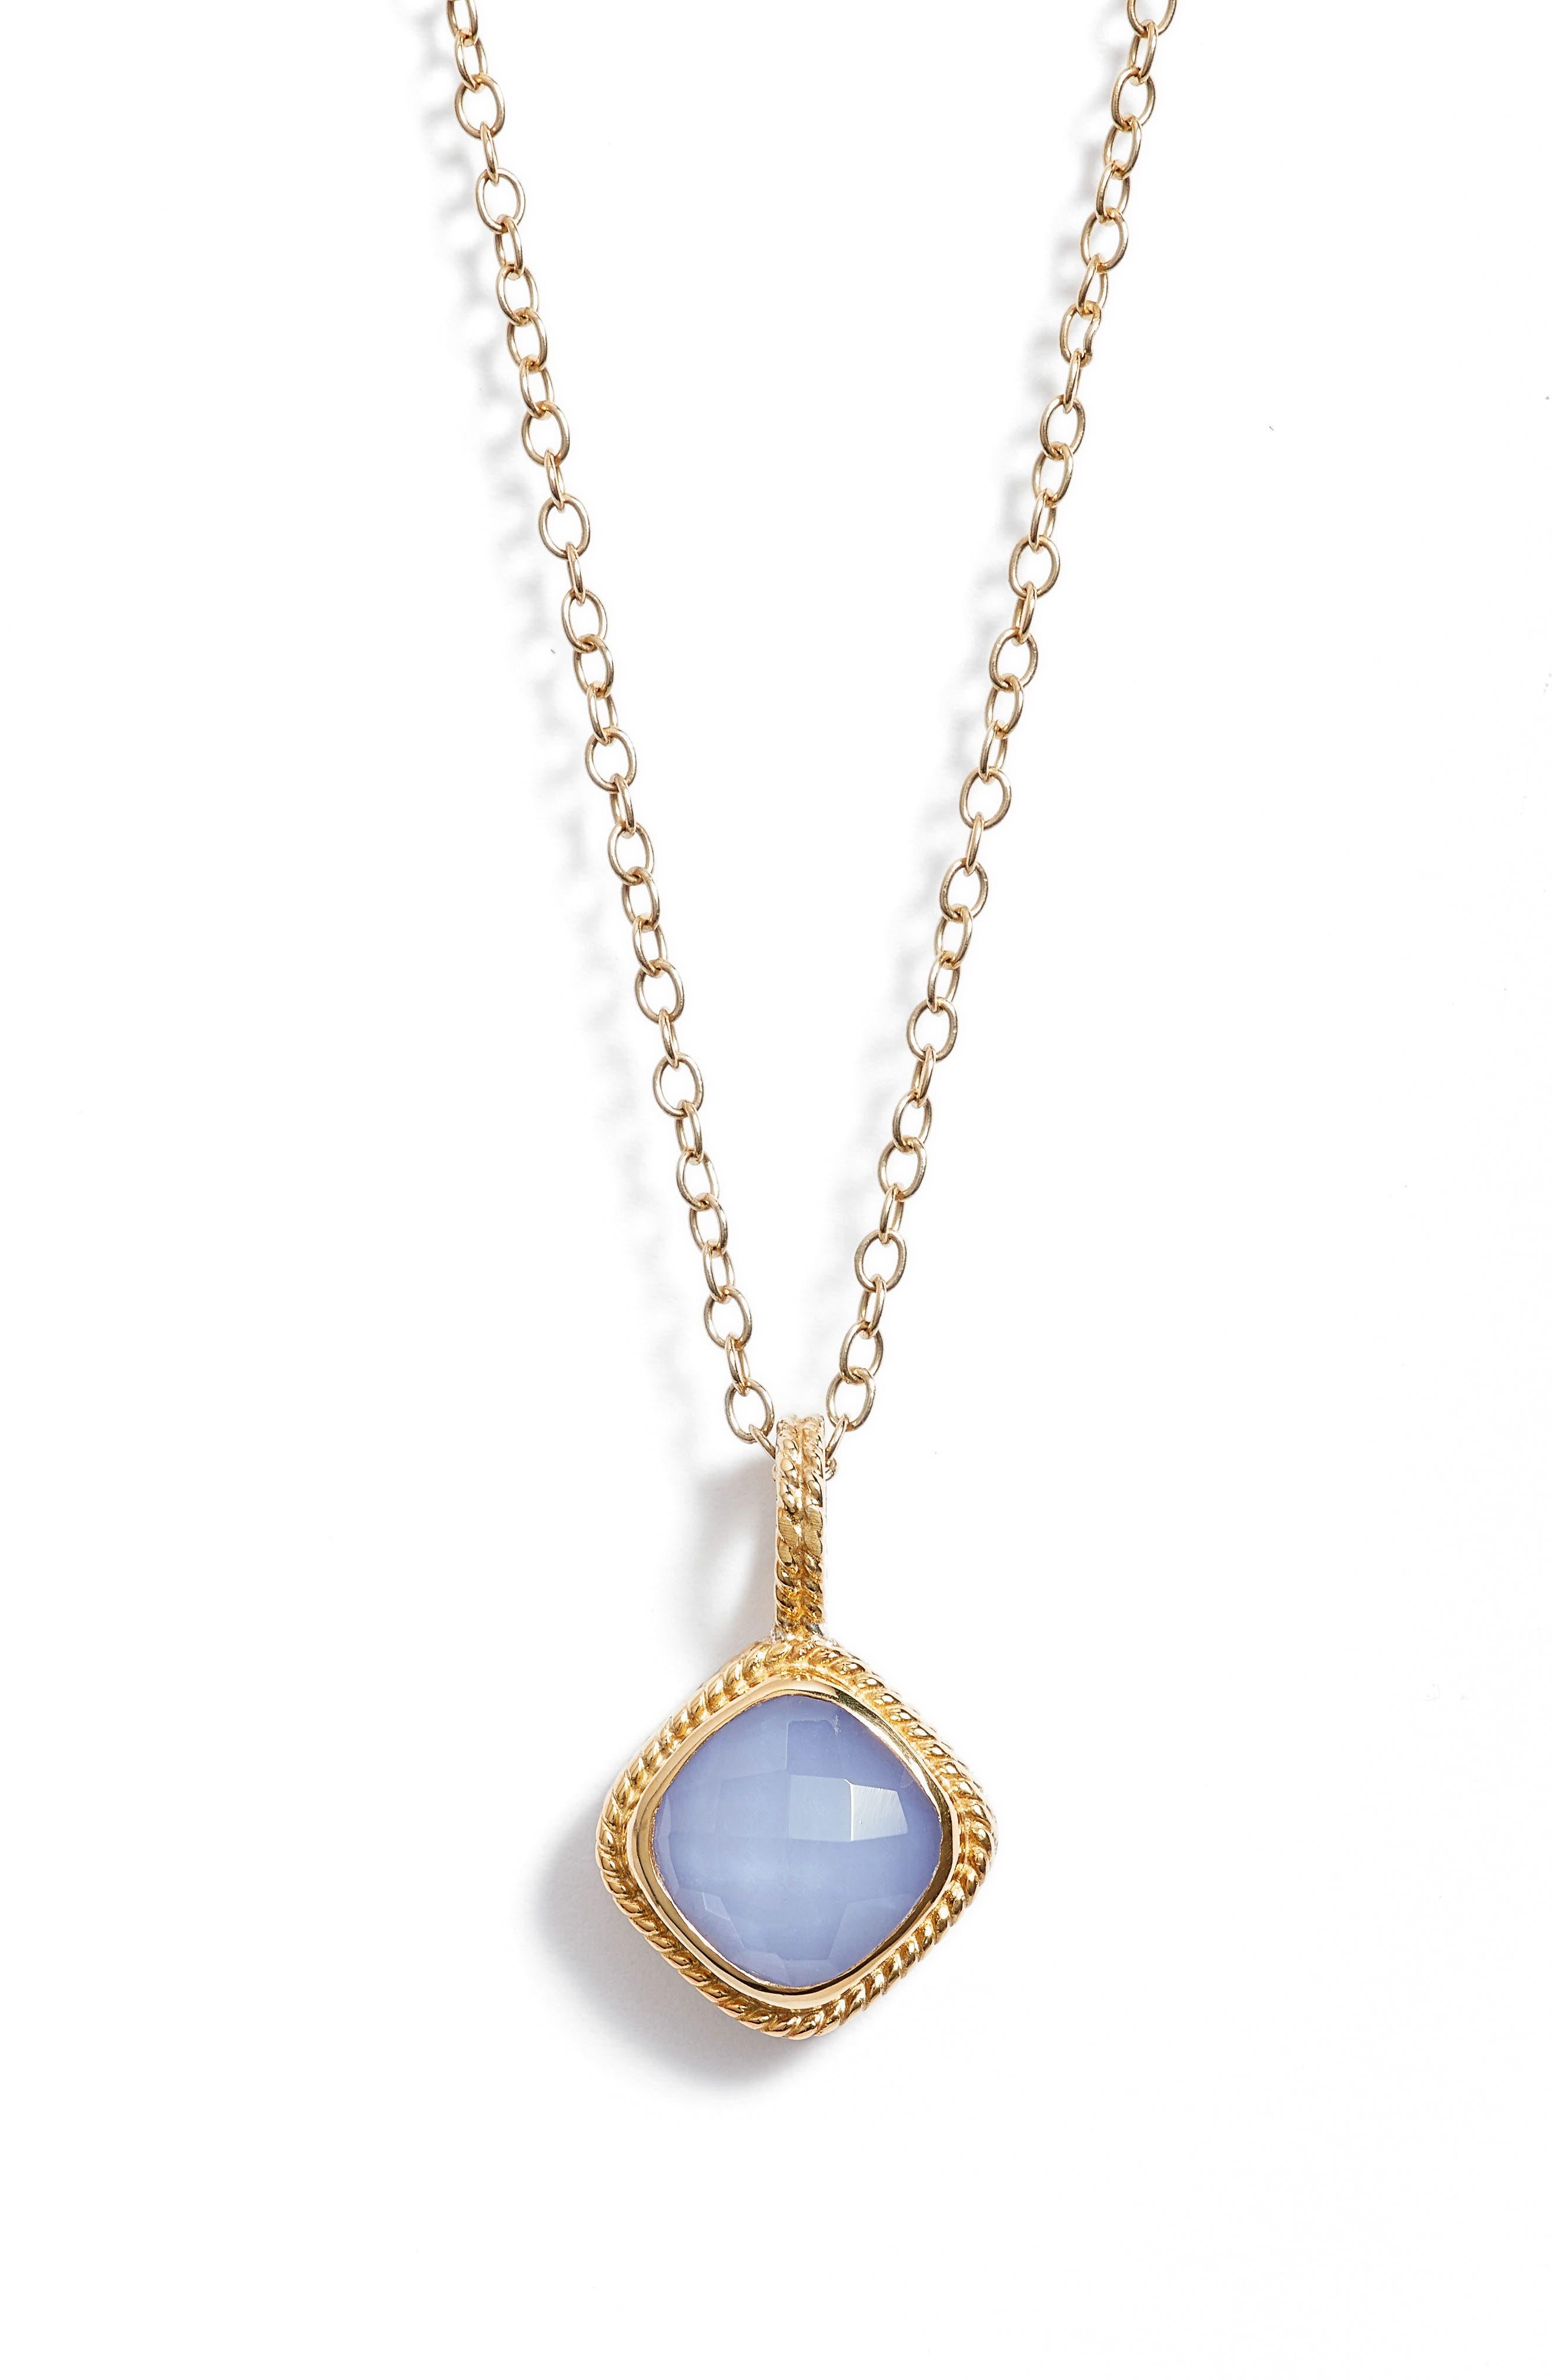 Semiprecious Stone Pendant Necklace,                         Main,                         color, Gold/ Blue Chalcedony